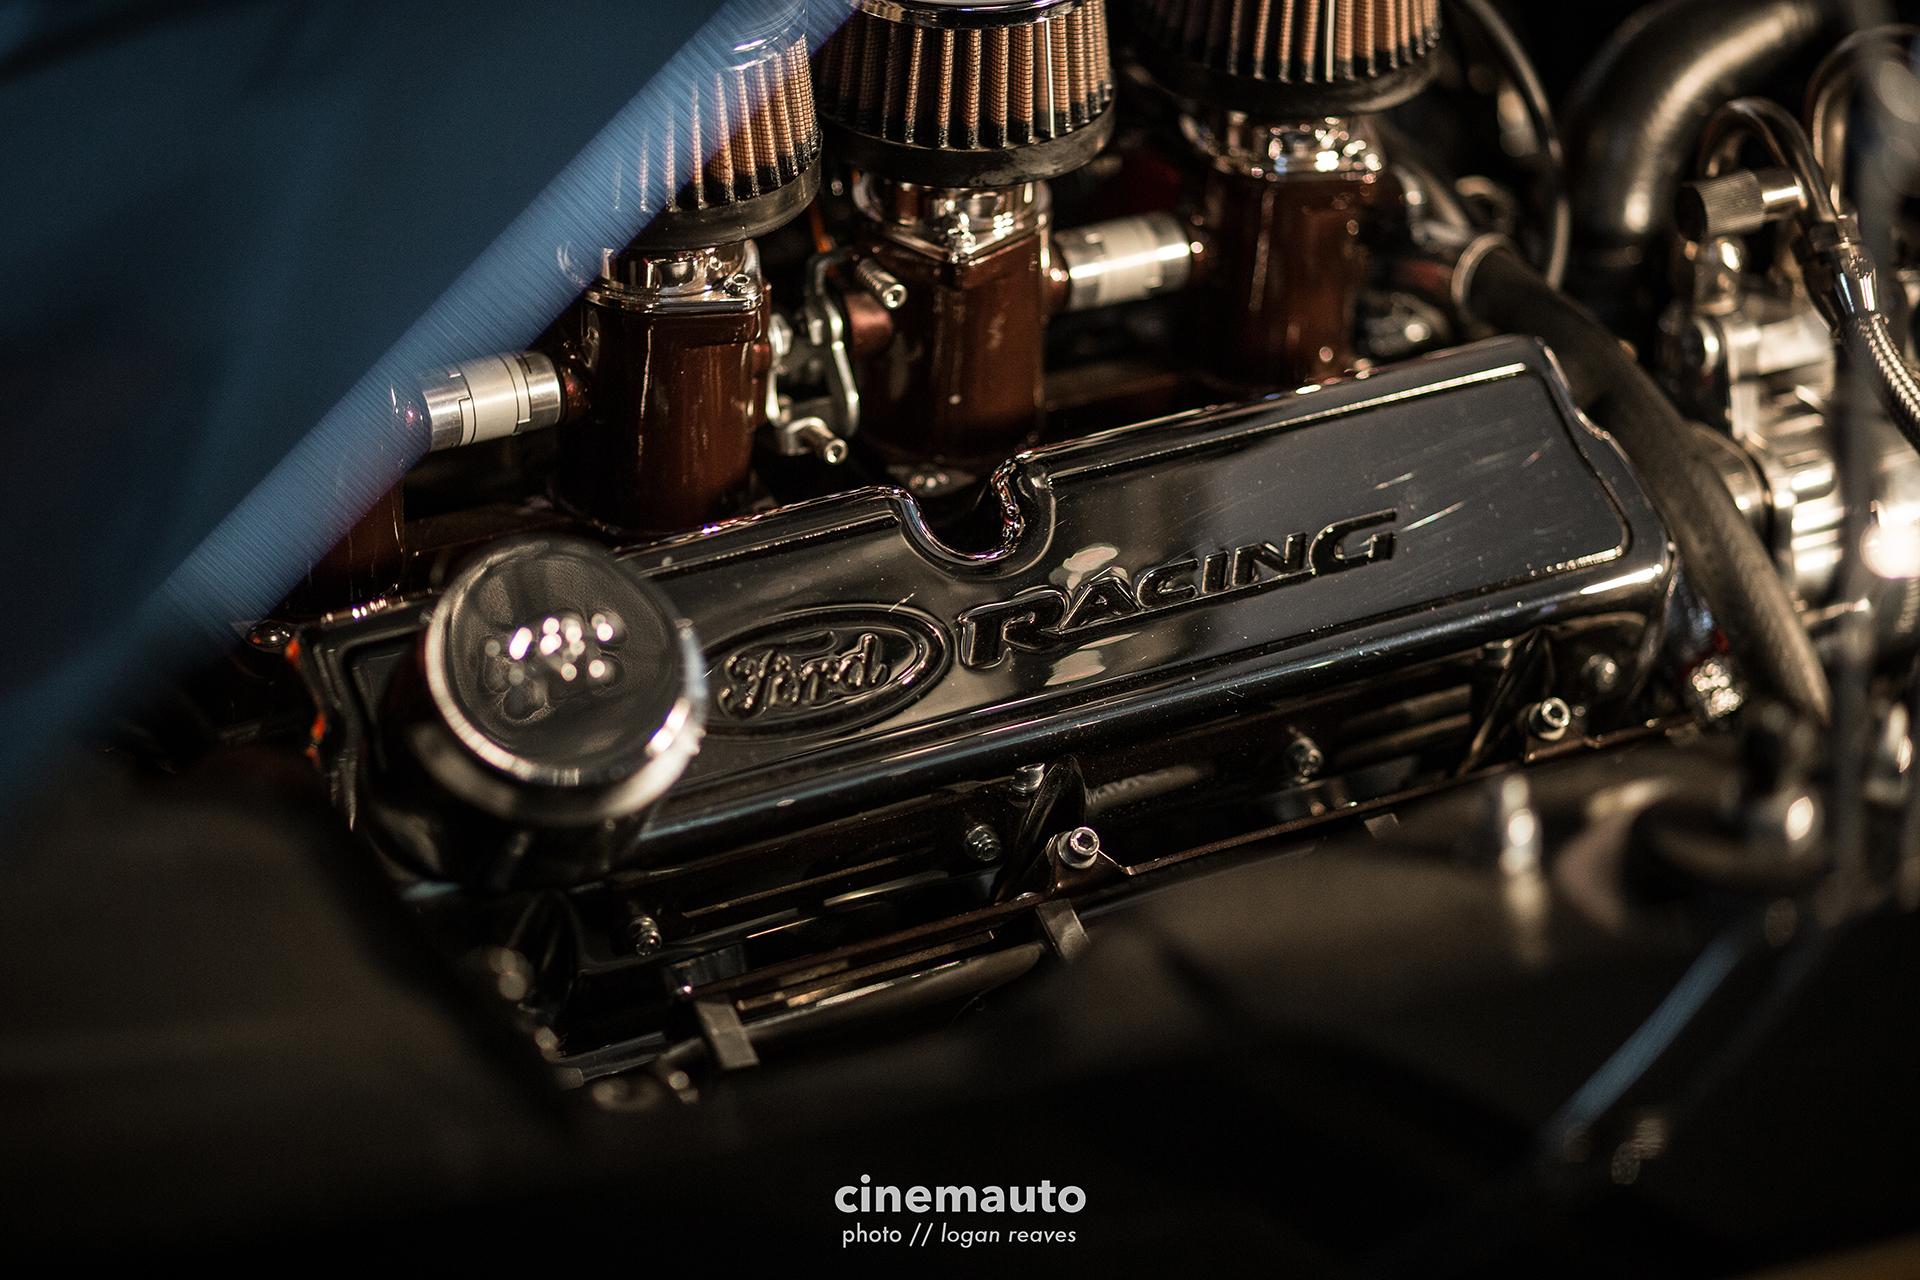 cinemauto-ford-capri-engine.jpg